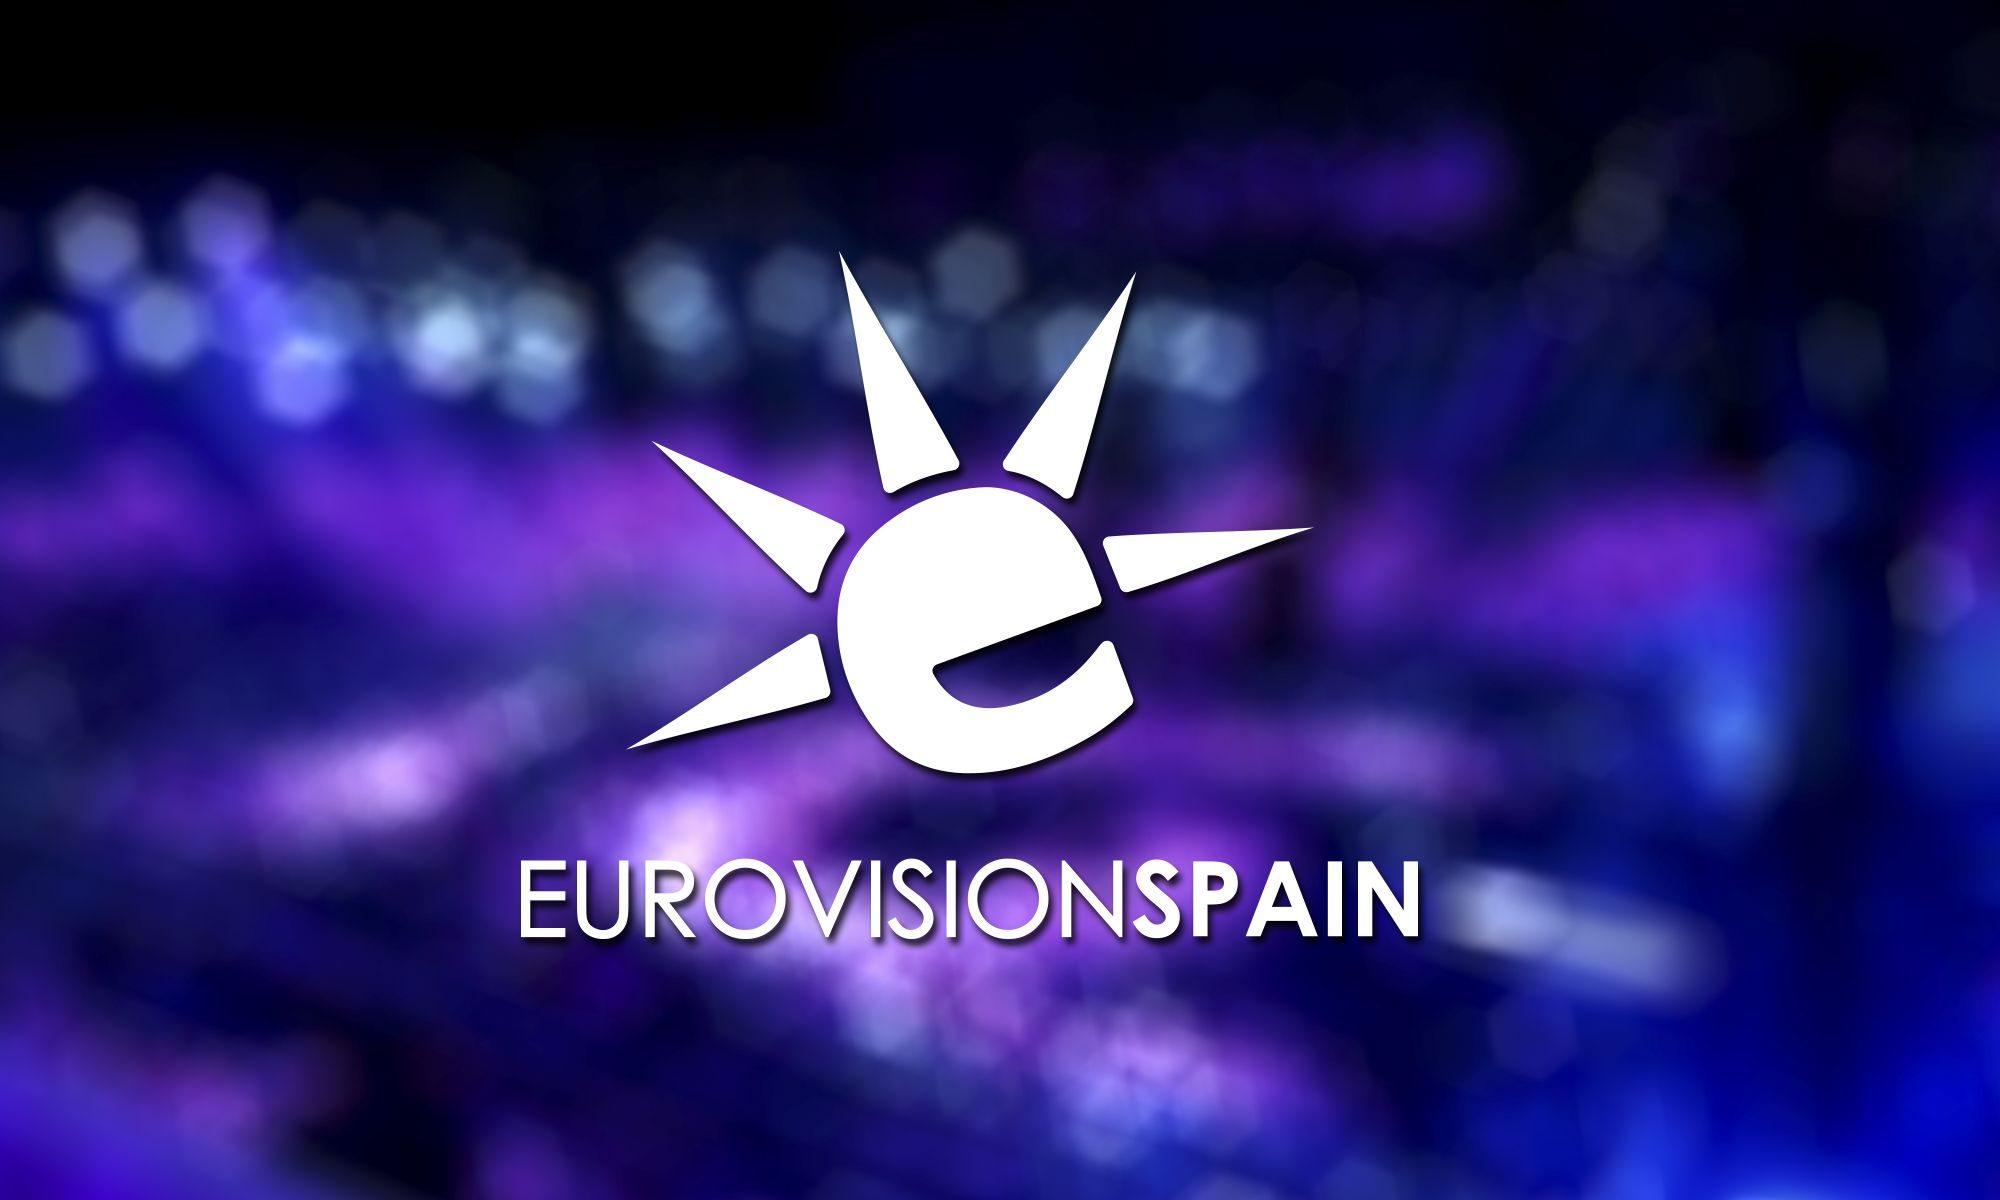 sin_ano_30122014_033432_logo_eurovisionspain_grande-8